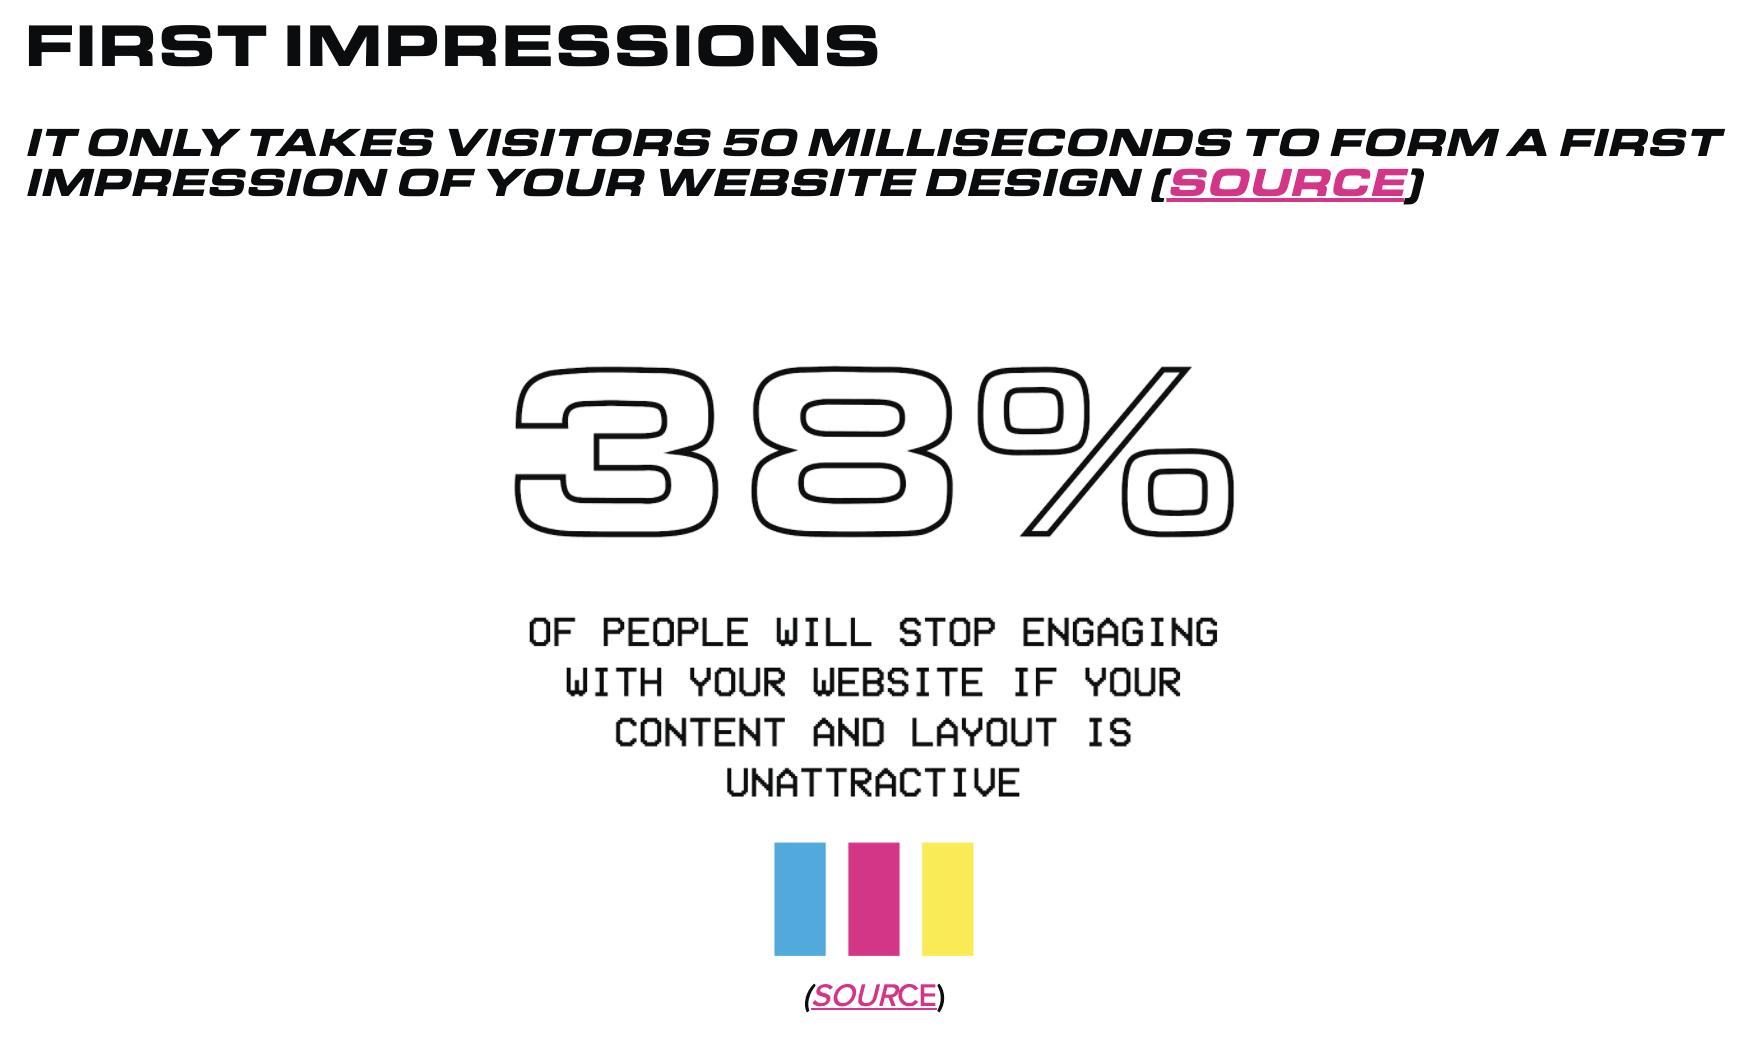 design-website-statistic